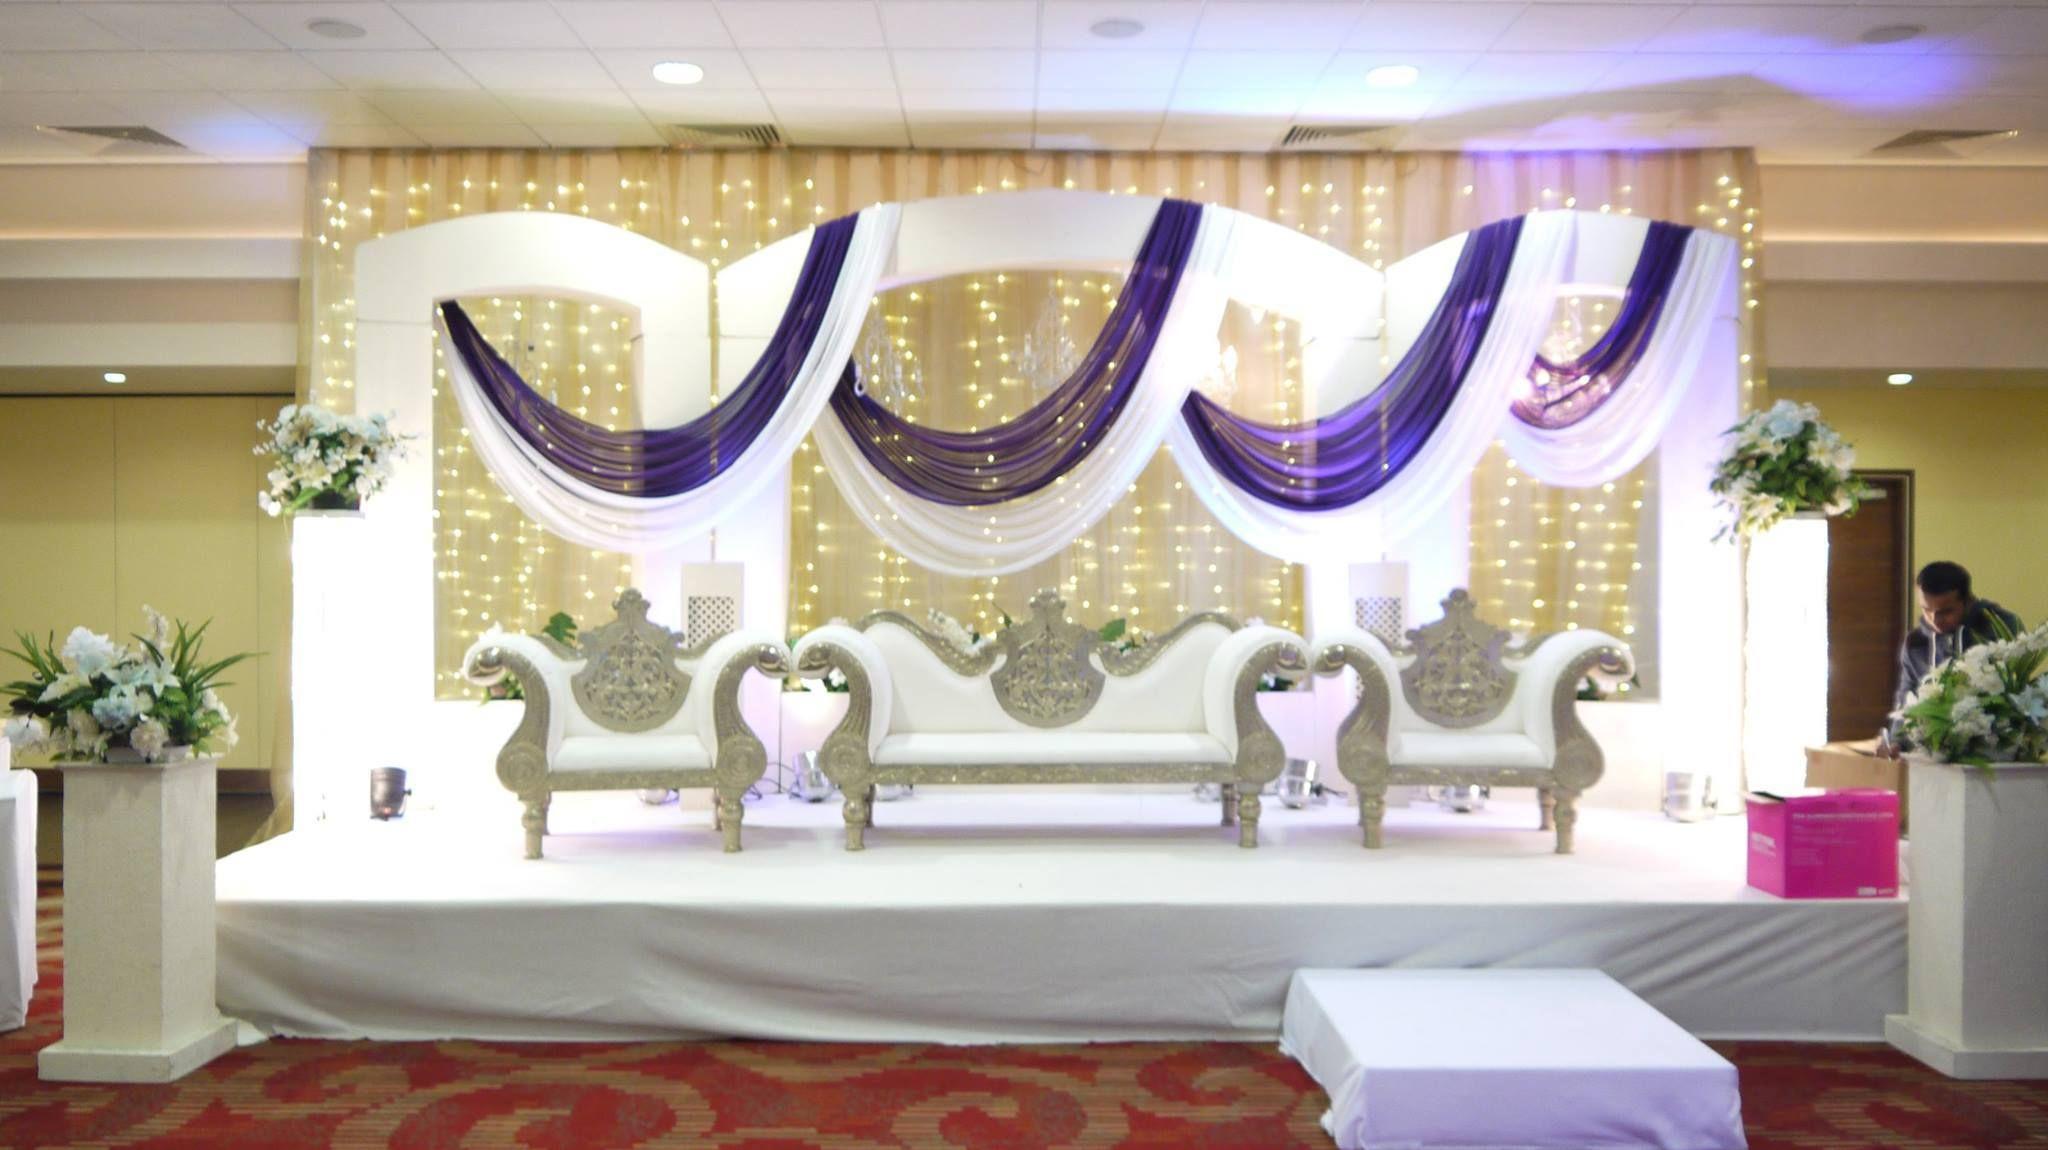 Google All Elegant Backdrops: The Elegant Wedding Stage Decoration In All White